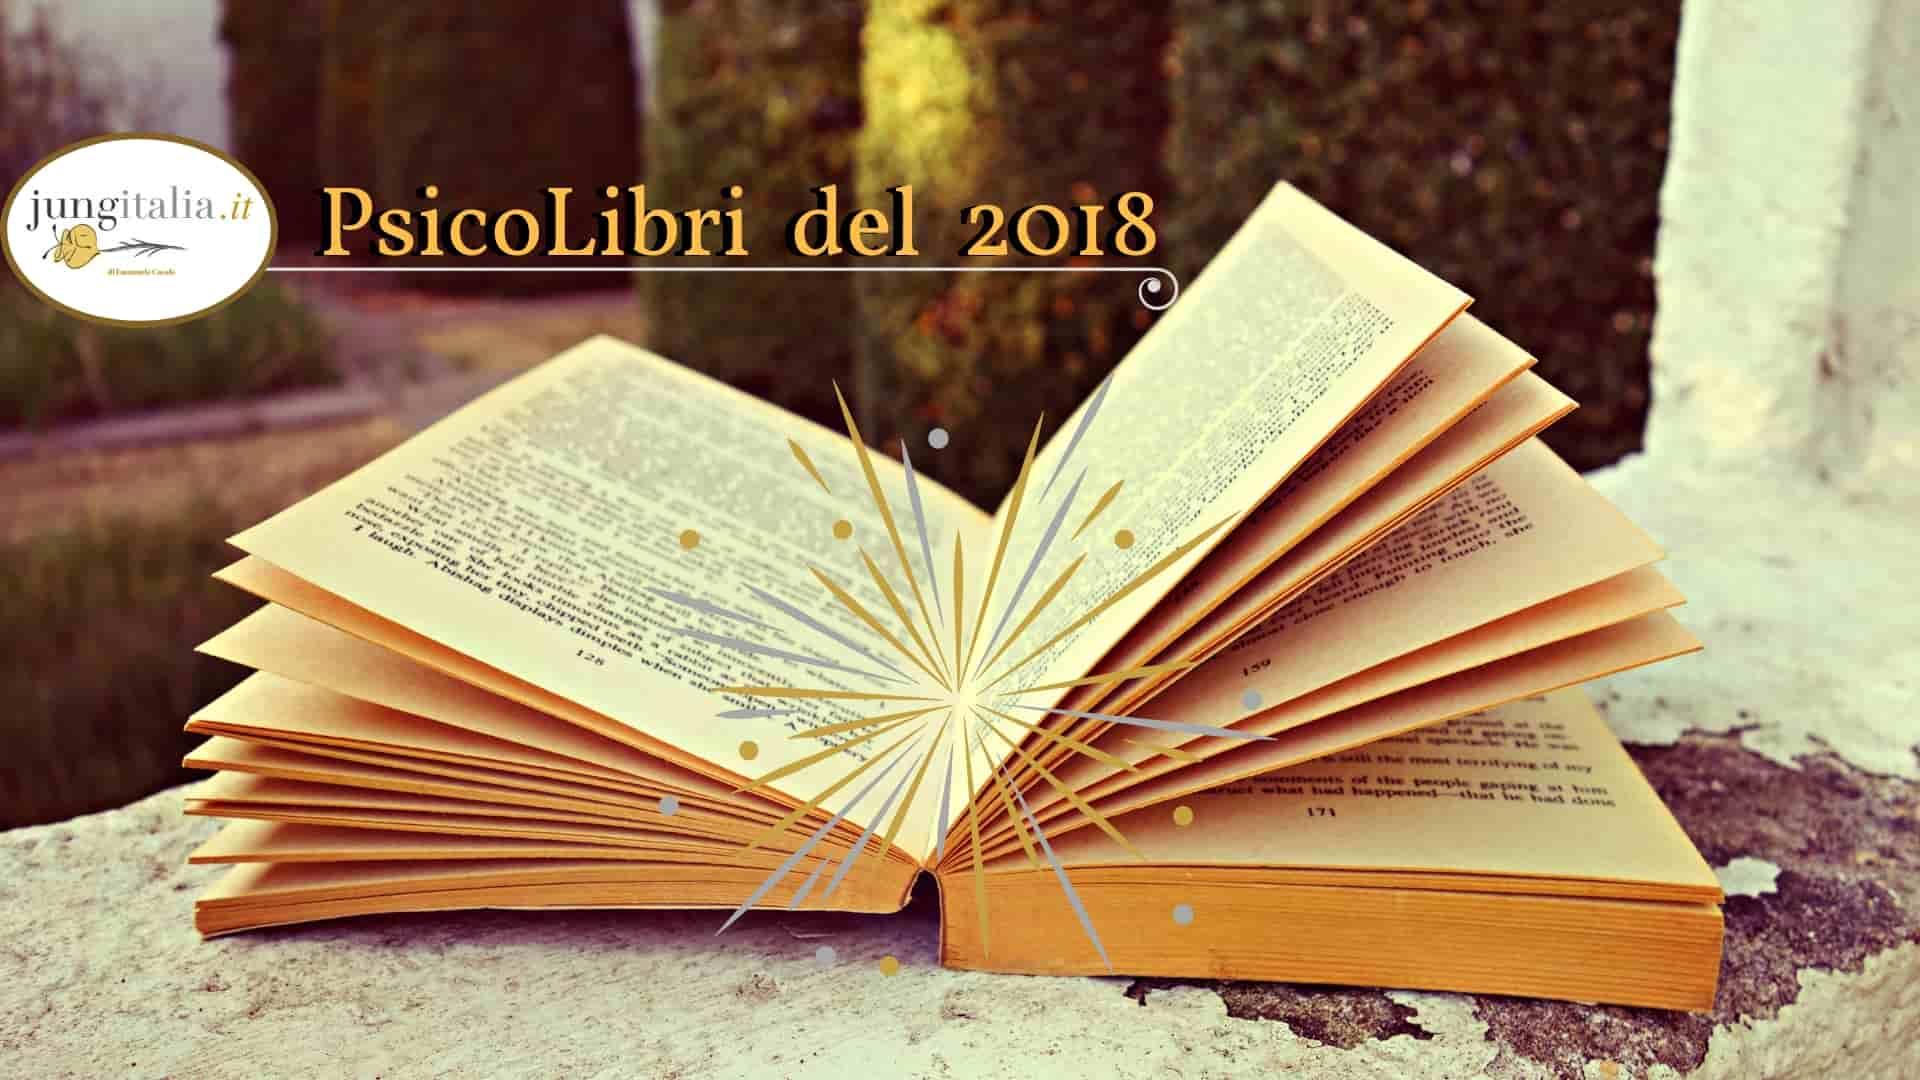 Libri di psicologia più belli 2018